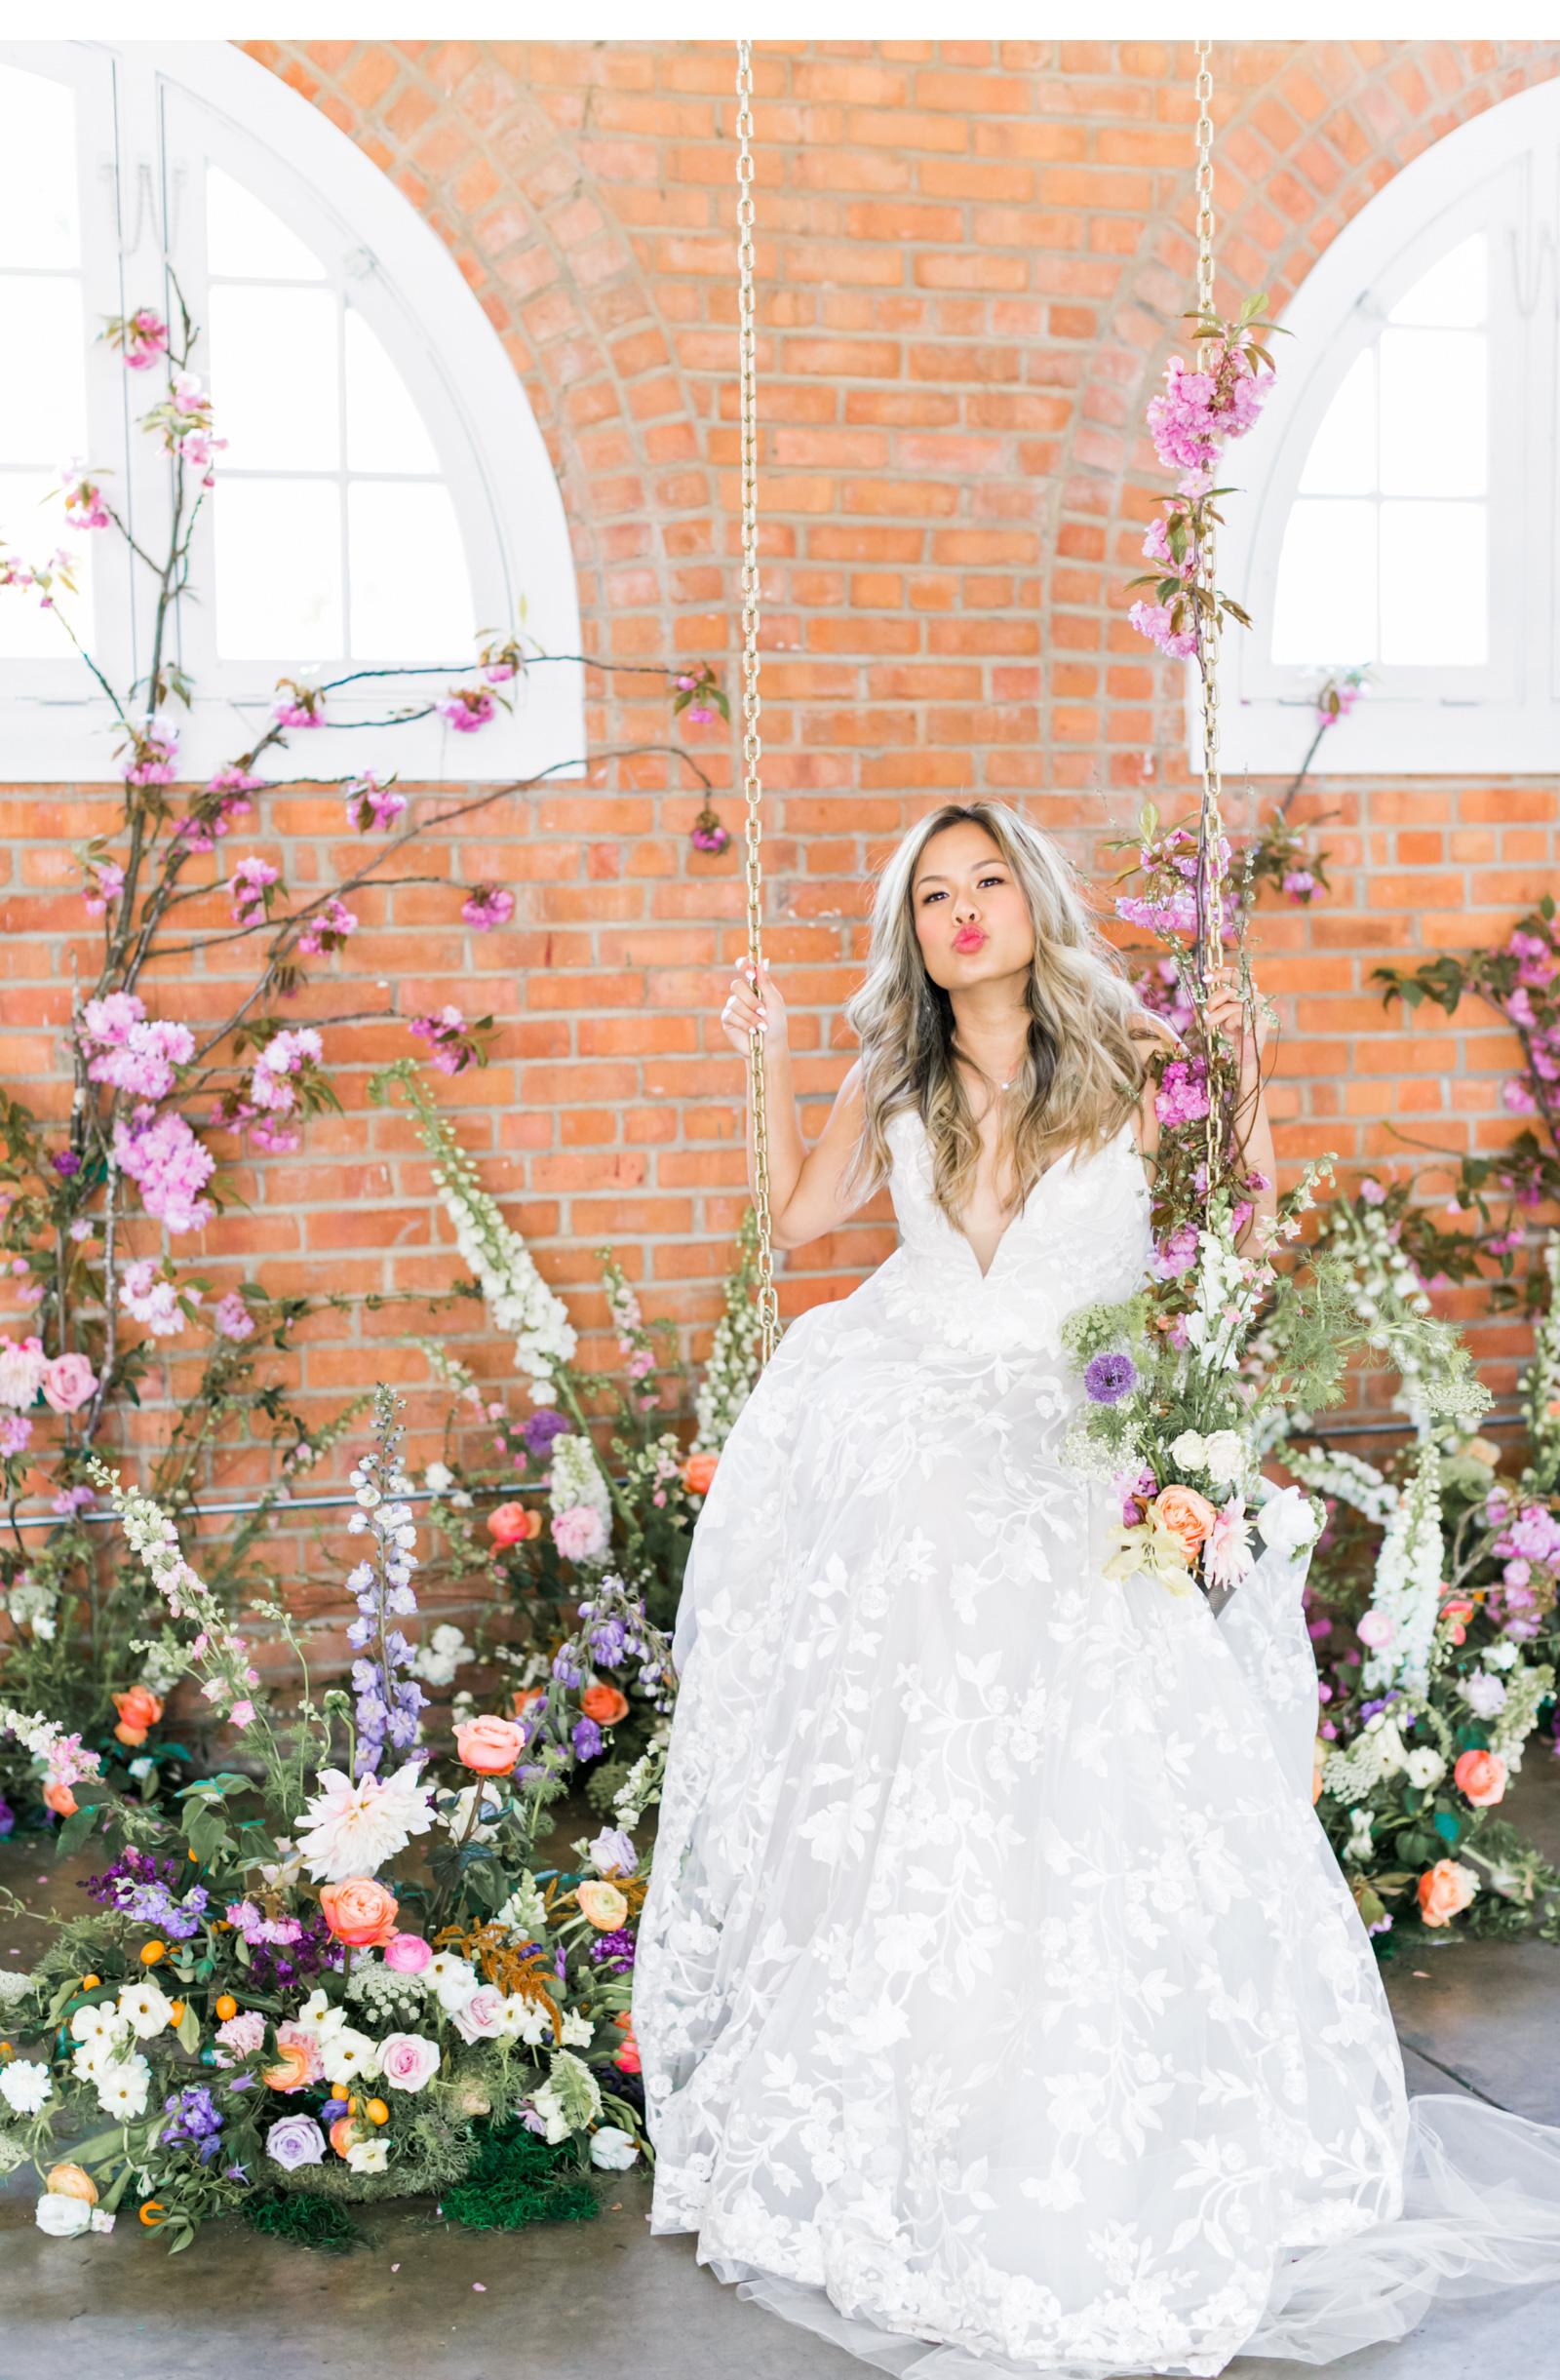 Malibu-Weddings-Natalie-Schutt-Photography-Inspired-by-This_04.jpg